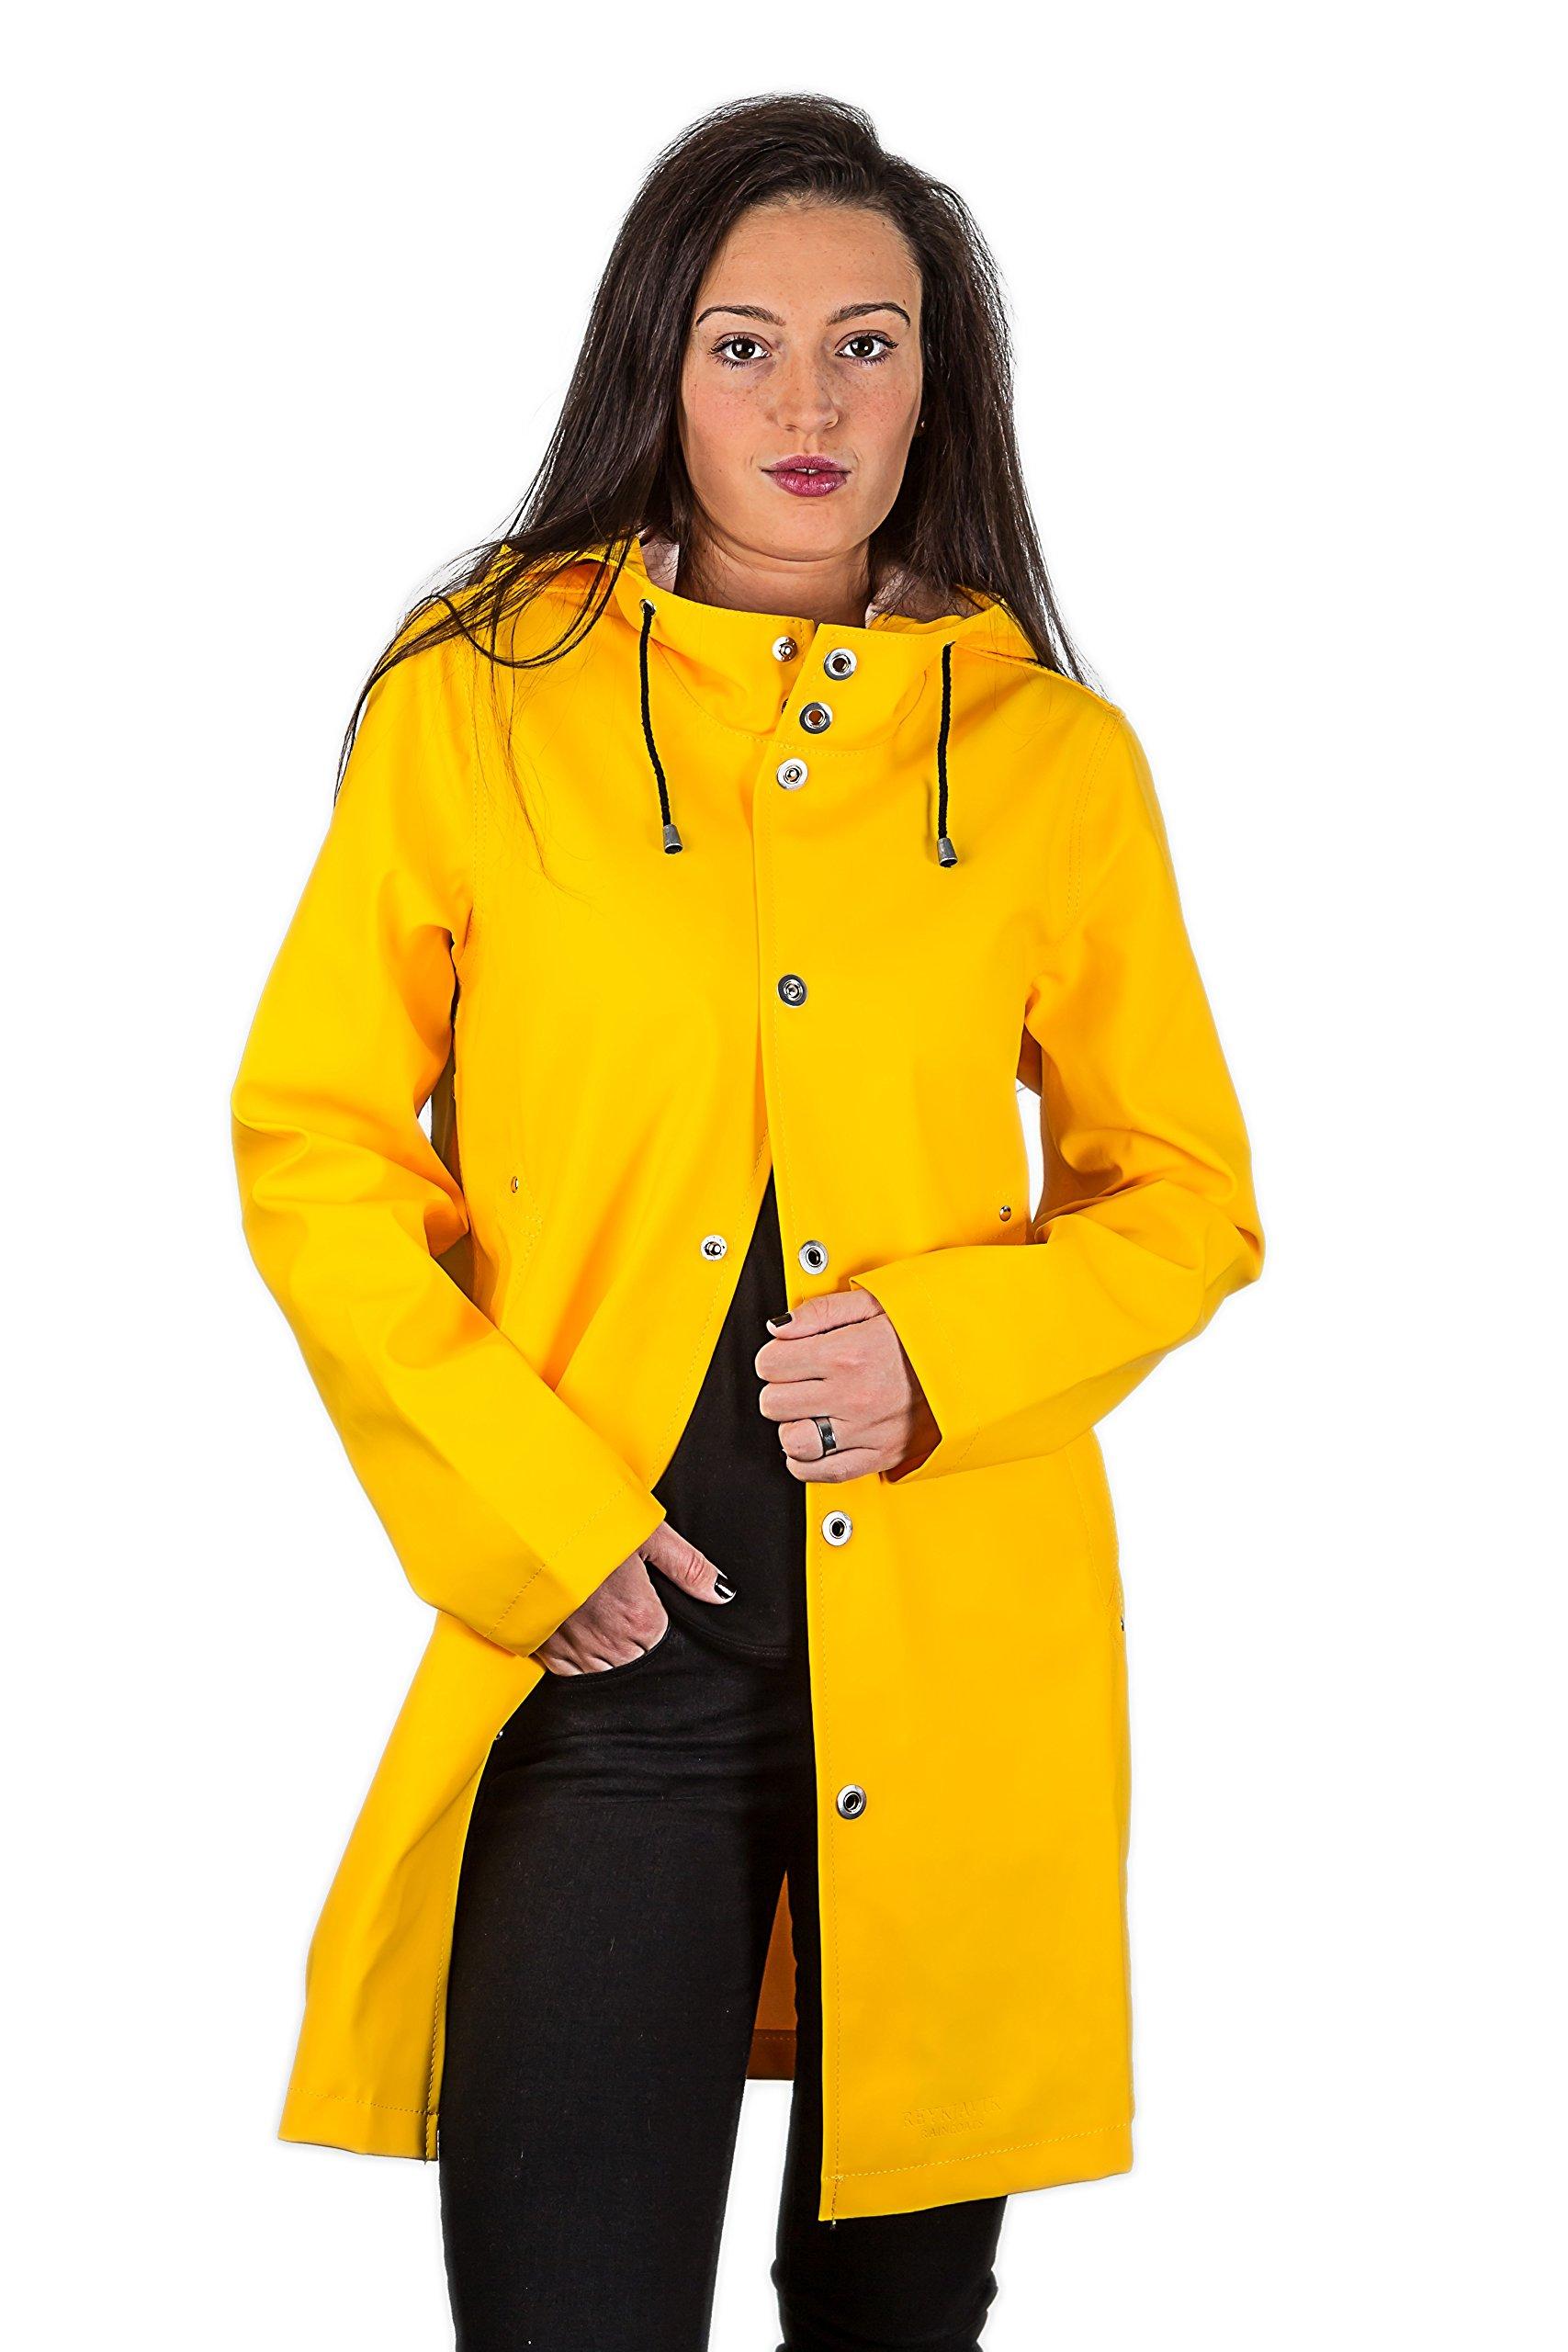 Stylish Urban Fisherman Style Rainwear Coat - Size S - Color Yellow by Reykjavik Raincoat